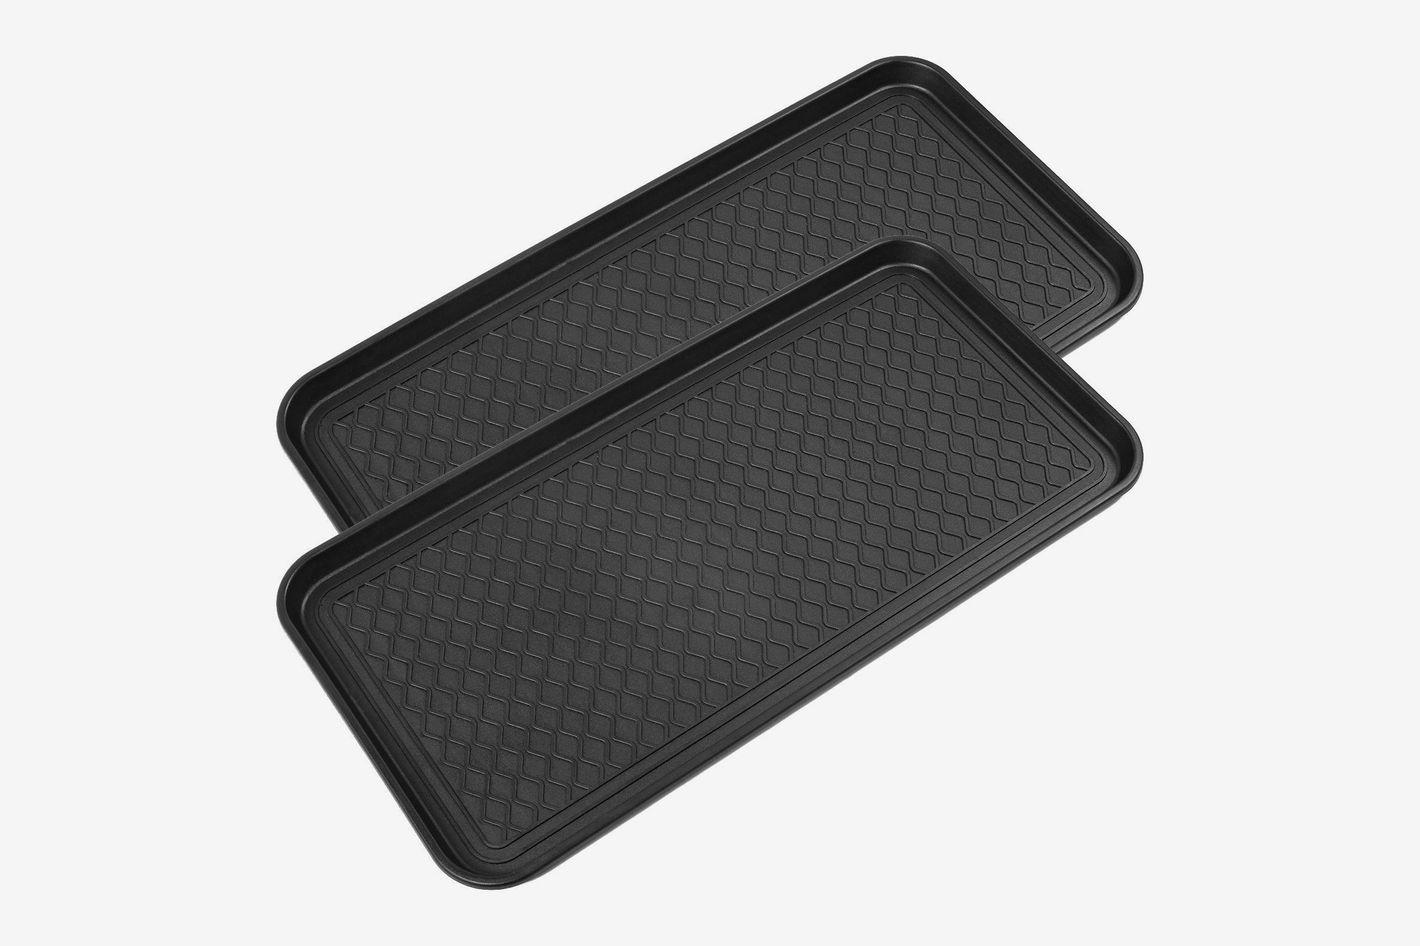 "California Home Goods Multi Purpose Black Boot Tray (30"" x 15"") — 2-Pack"